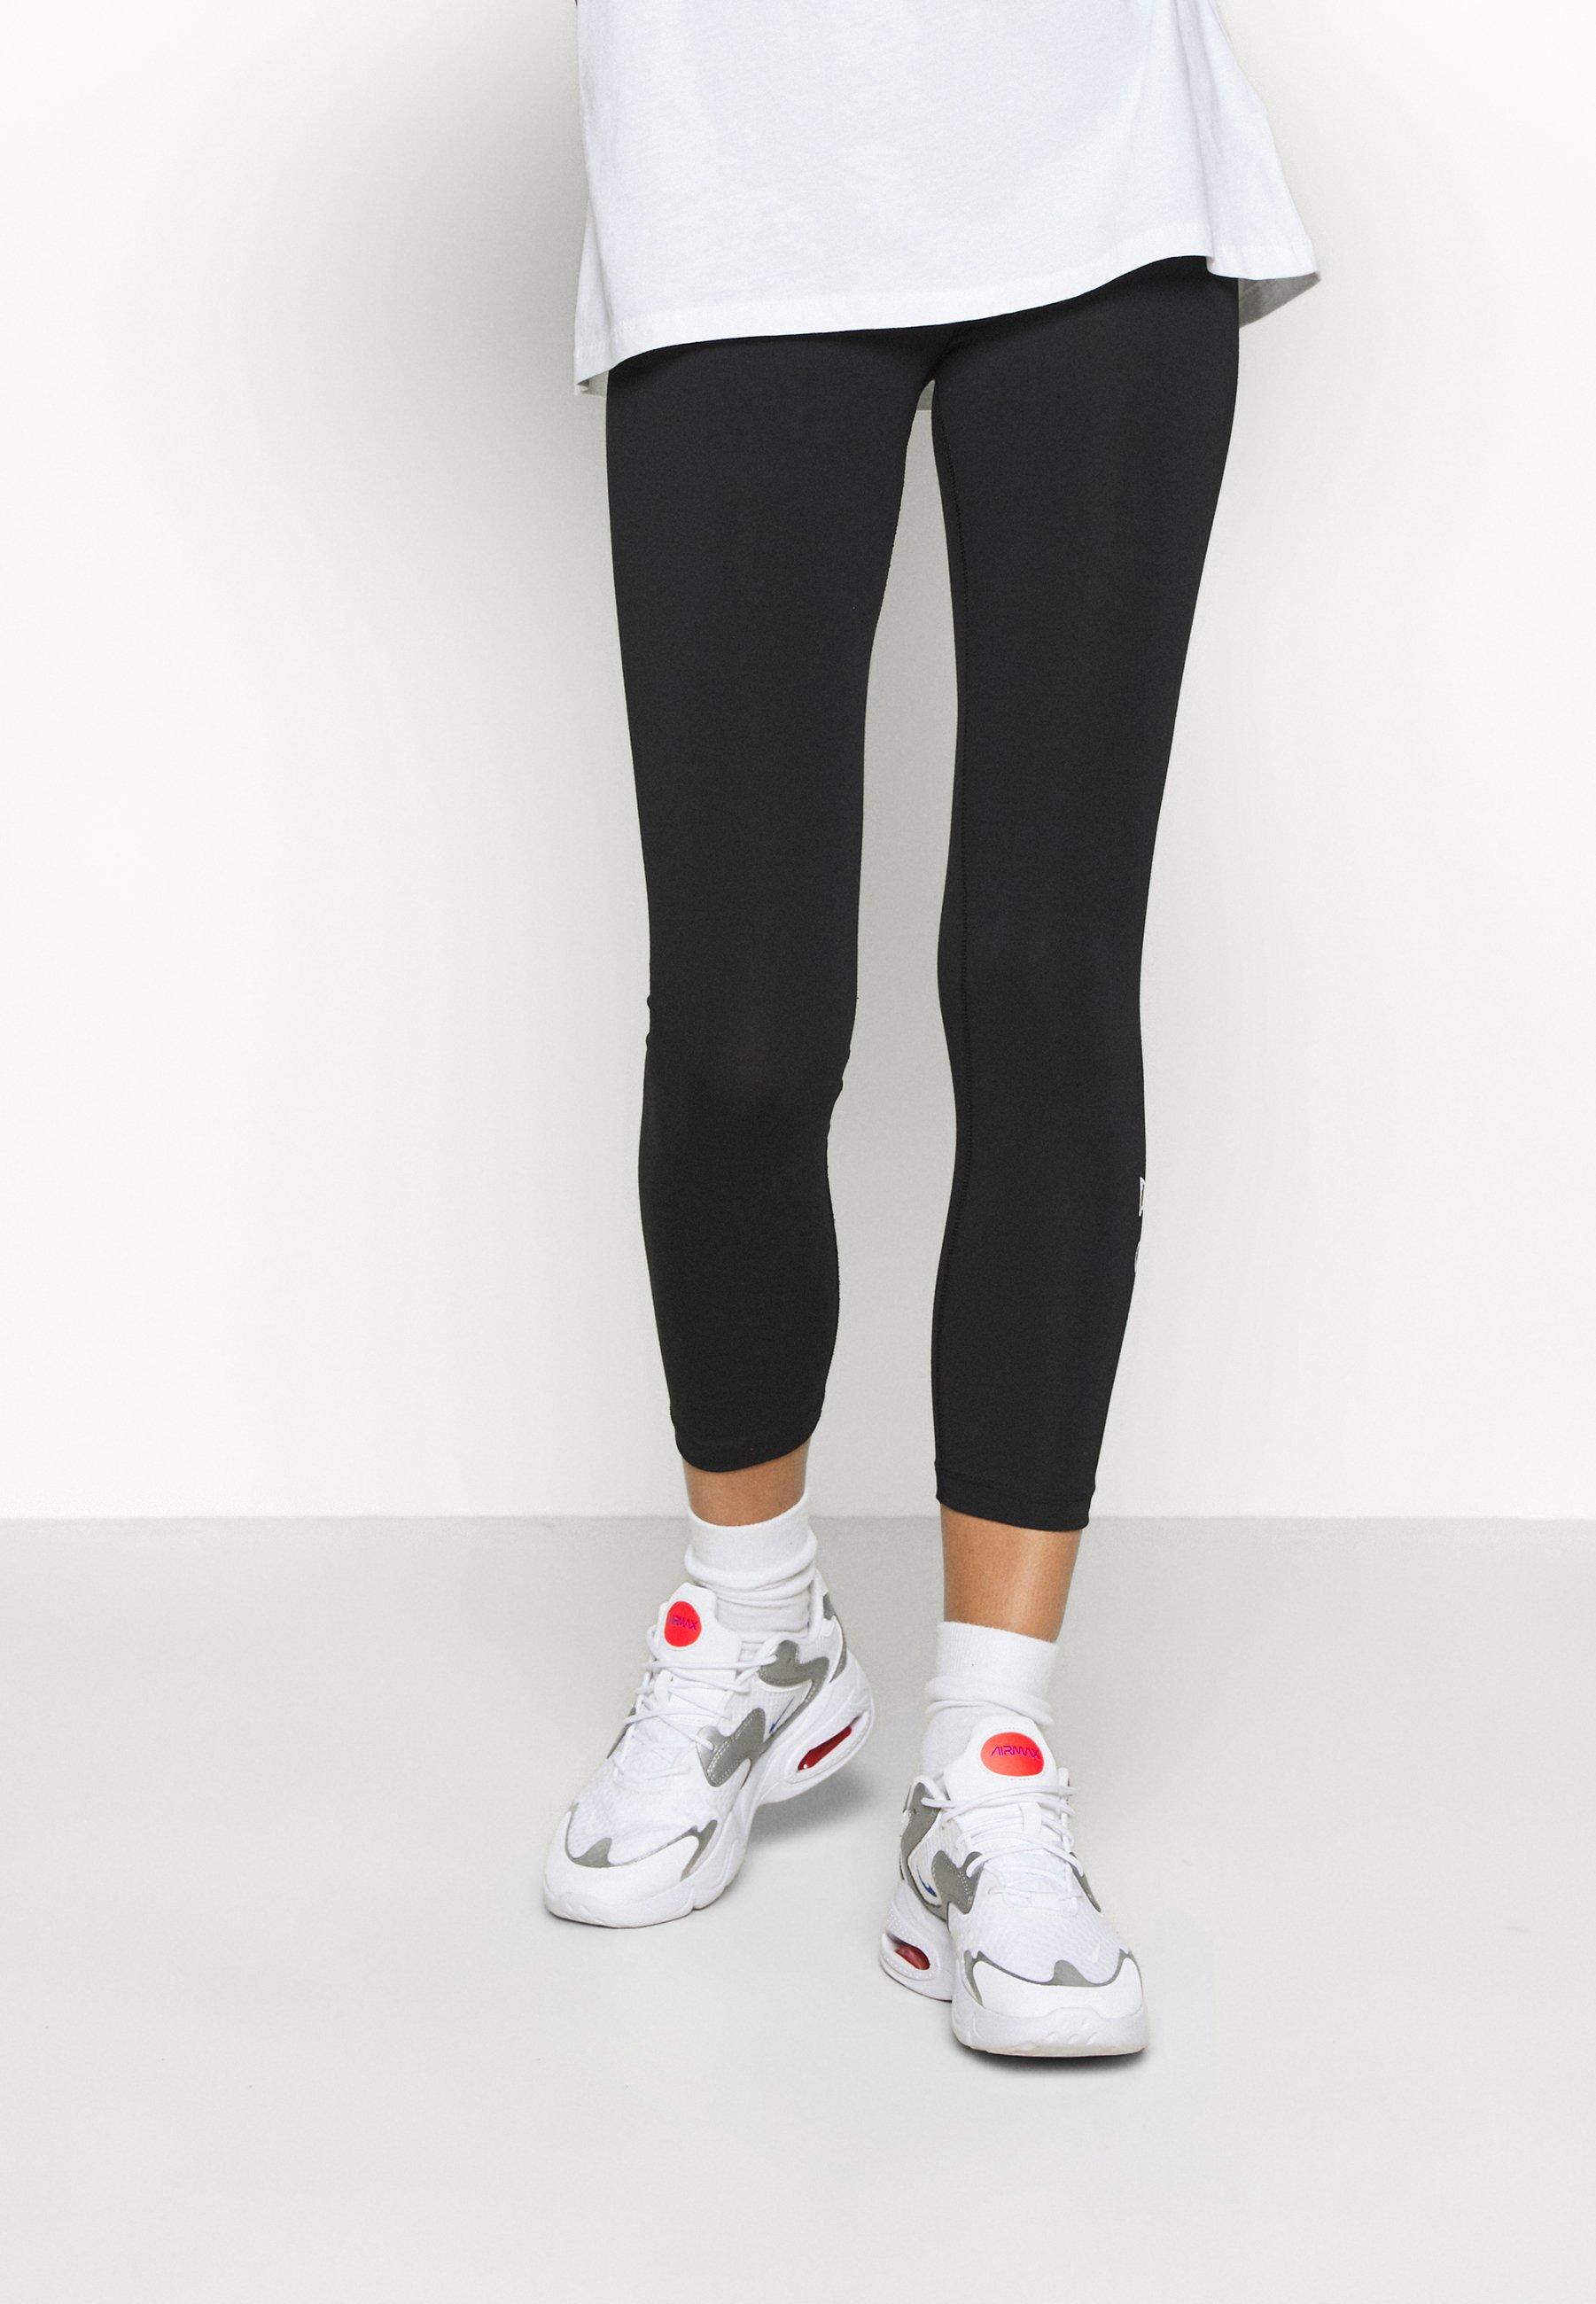 Nike Sportswear FEMME - Legging - black/noir - ZALANDO.FR